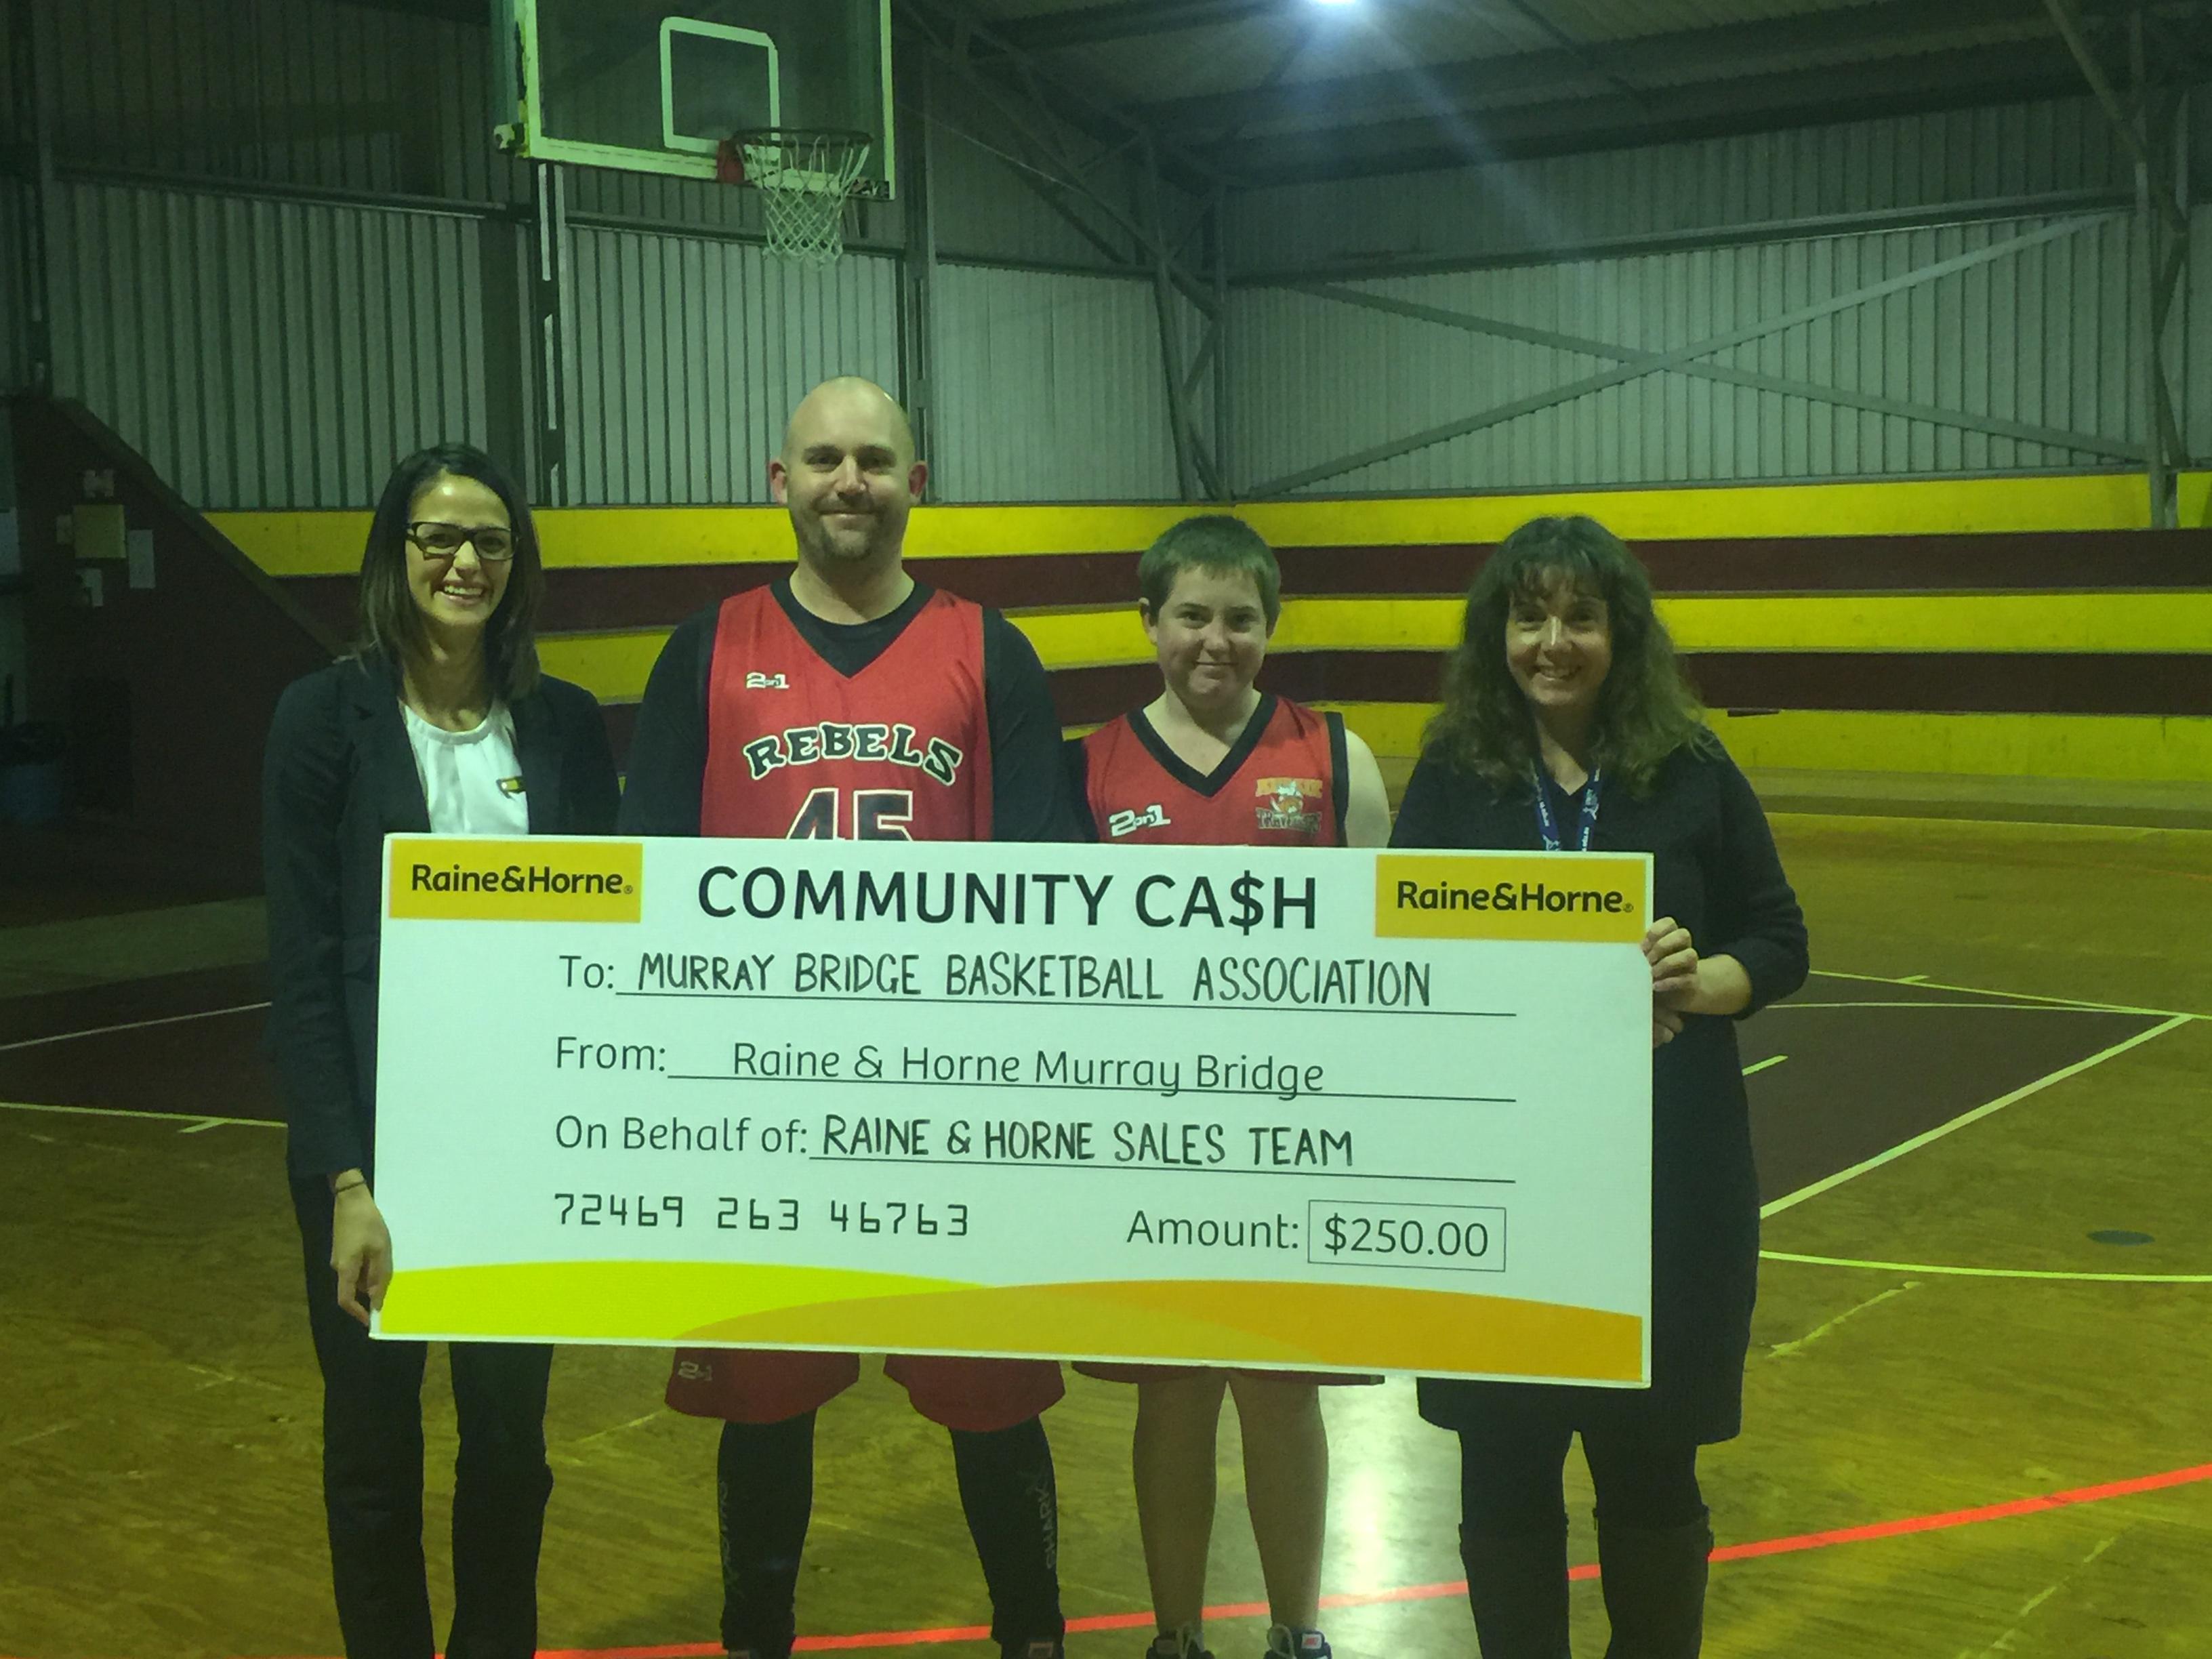 Community Cash - Murray Bridge Basketball Association